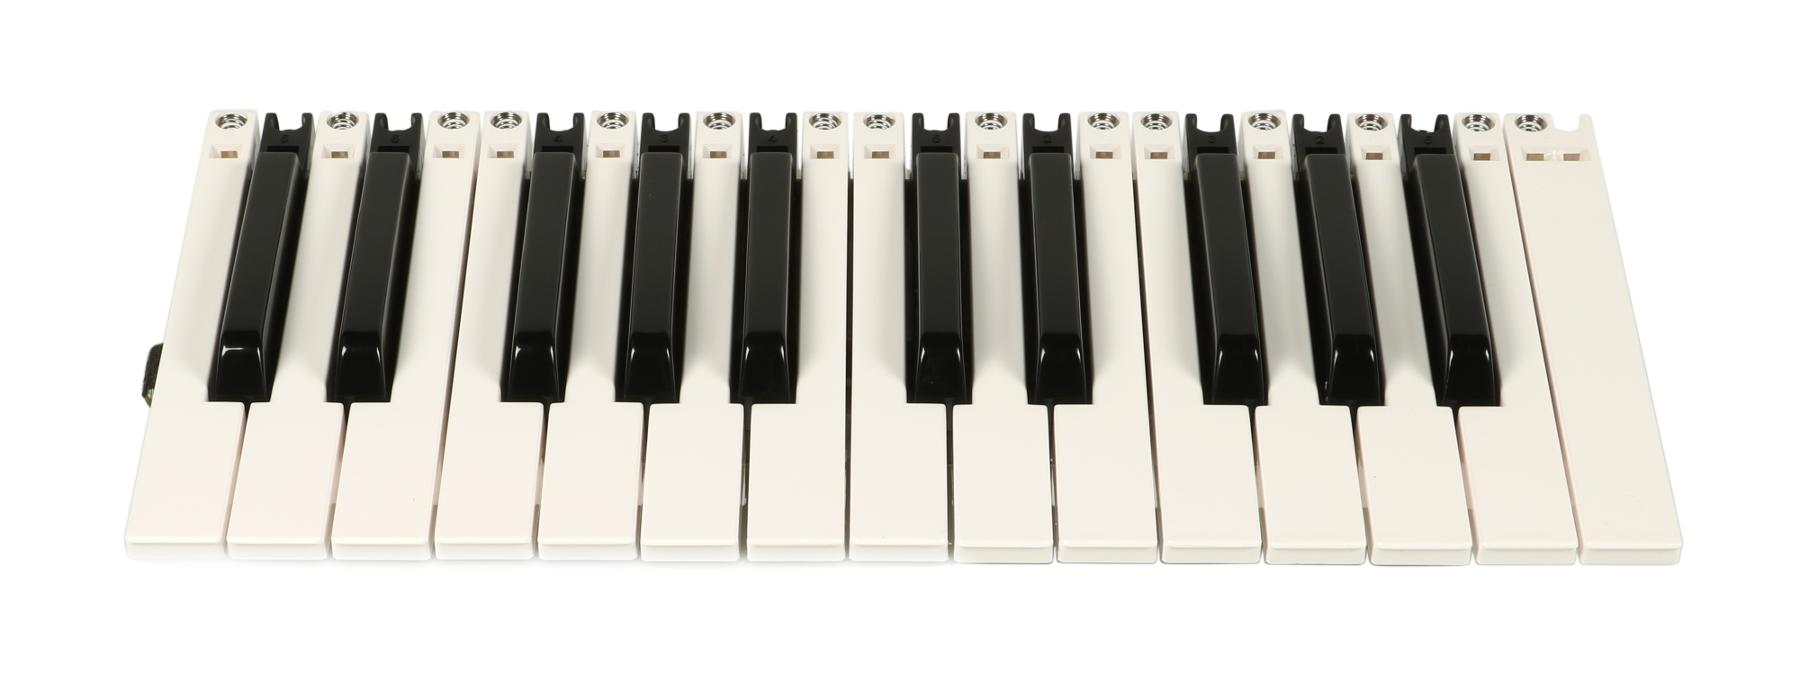 Novation 102060115  Keybed Assembly for Bass Station II 102060115